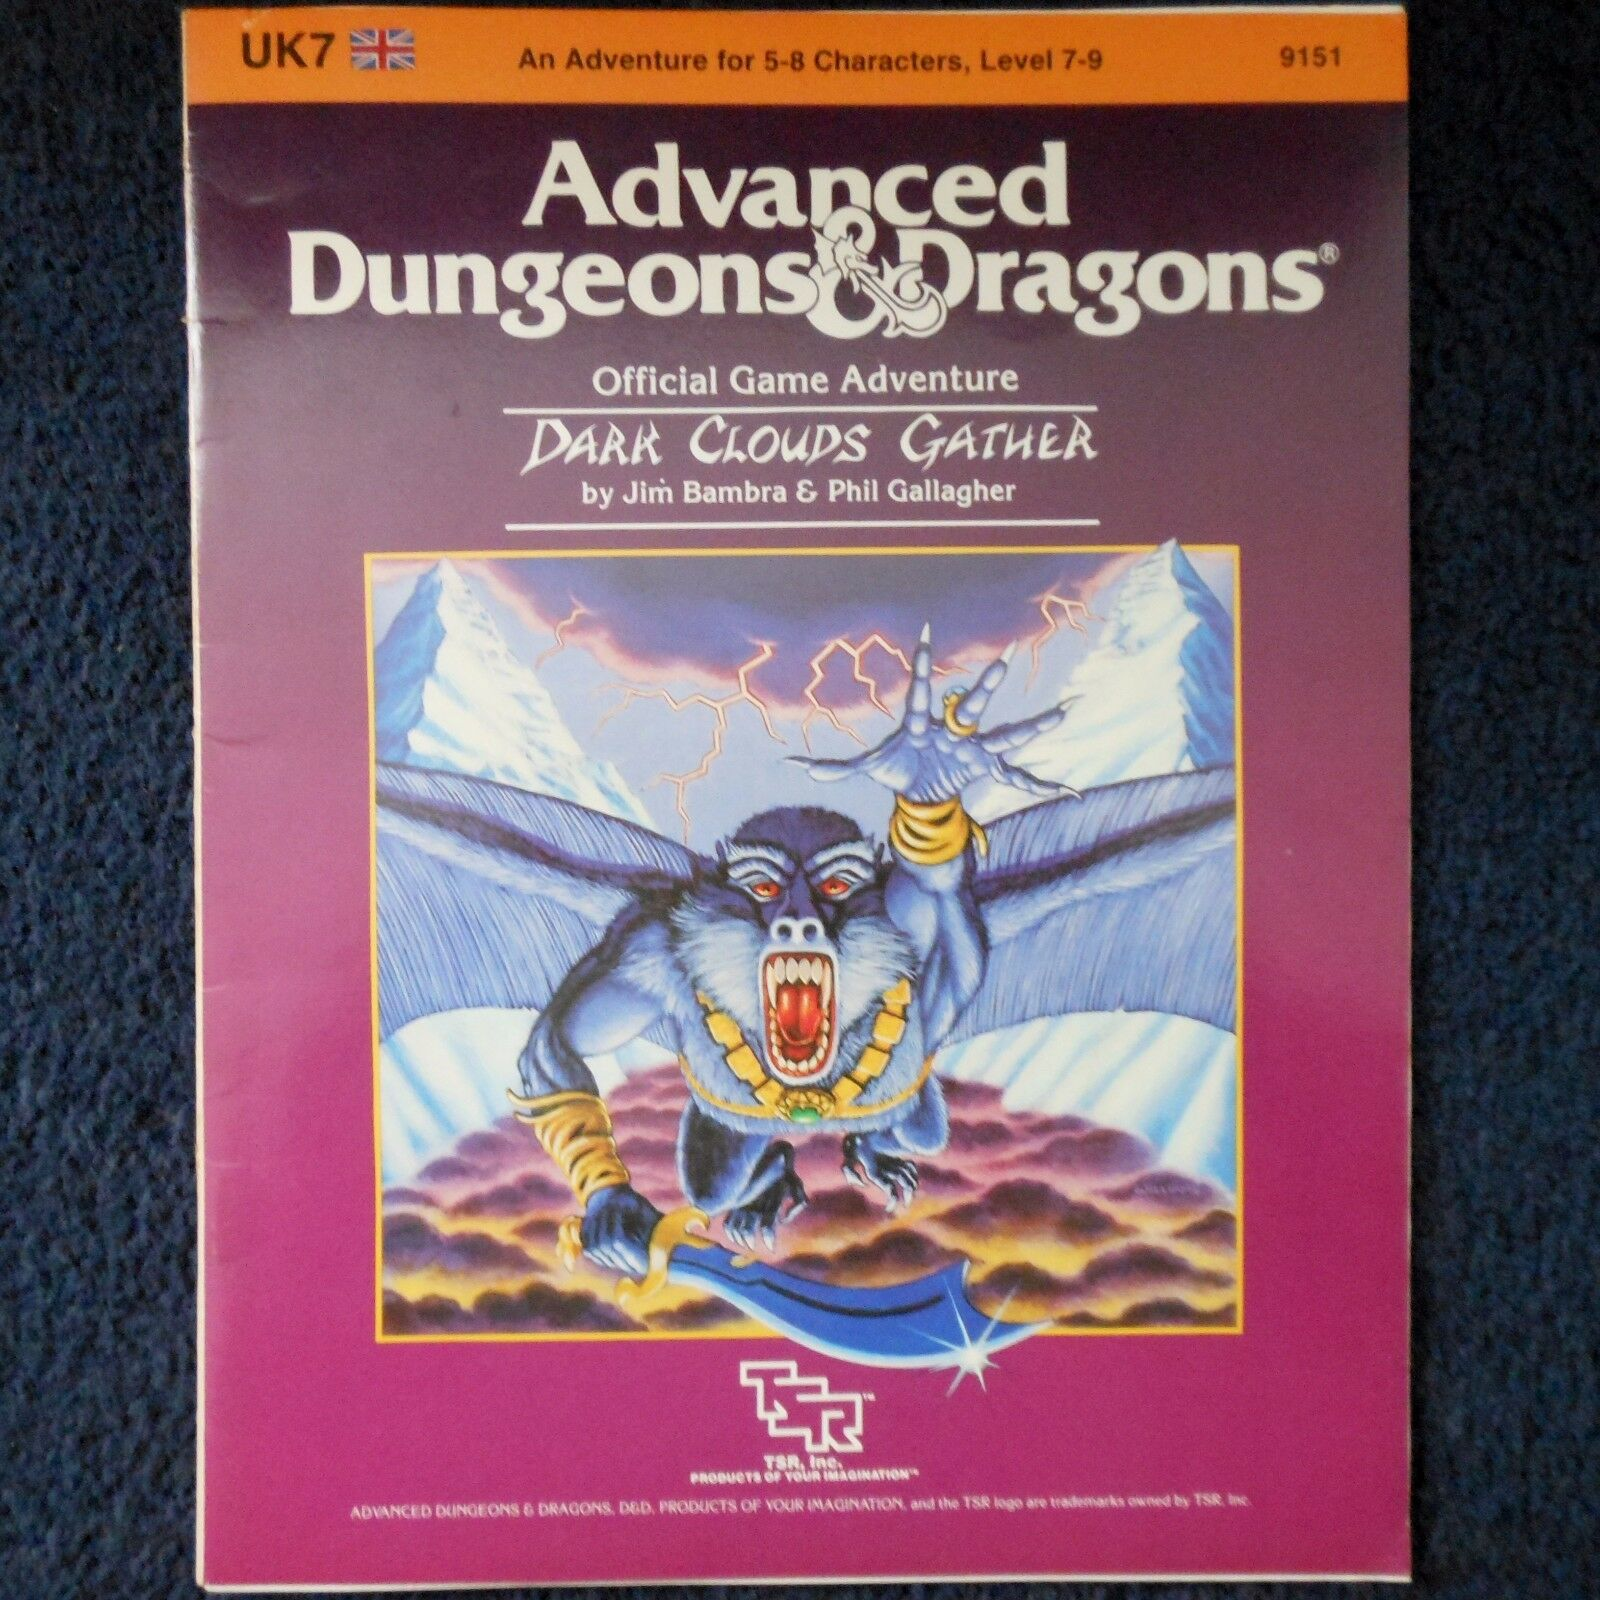 UK7 Dark Clouds Gather Advanced Dungeons & Dragons Adventure Module D&D 9151 TSR